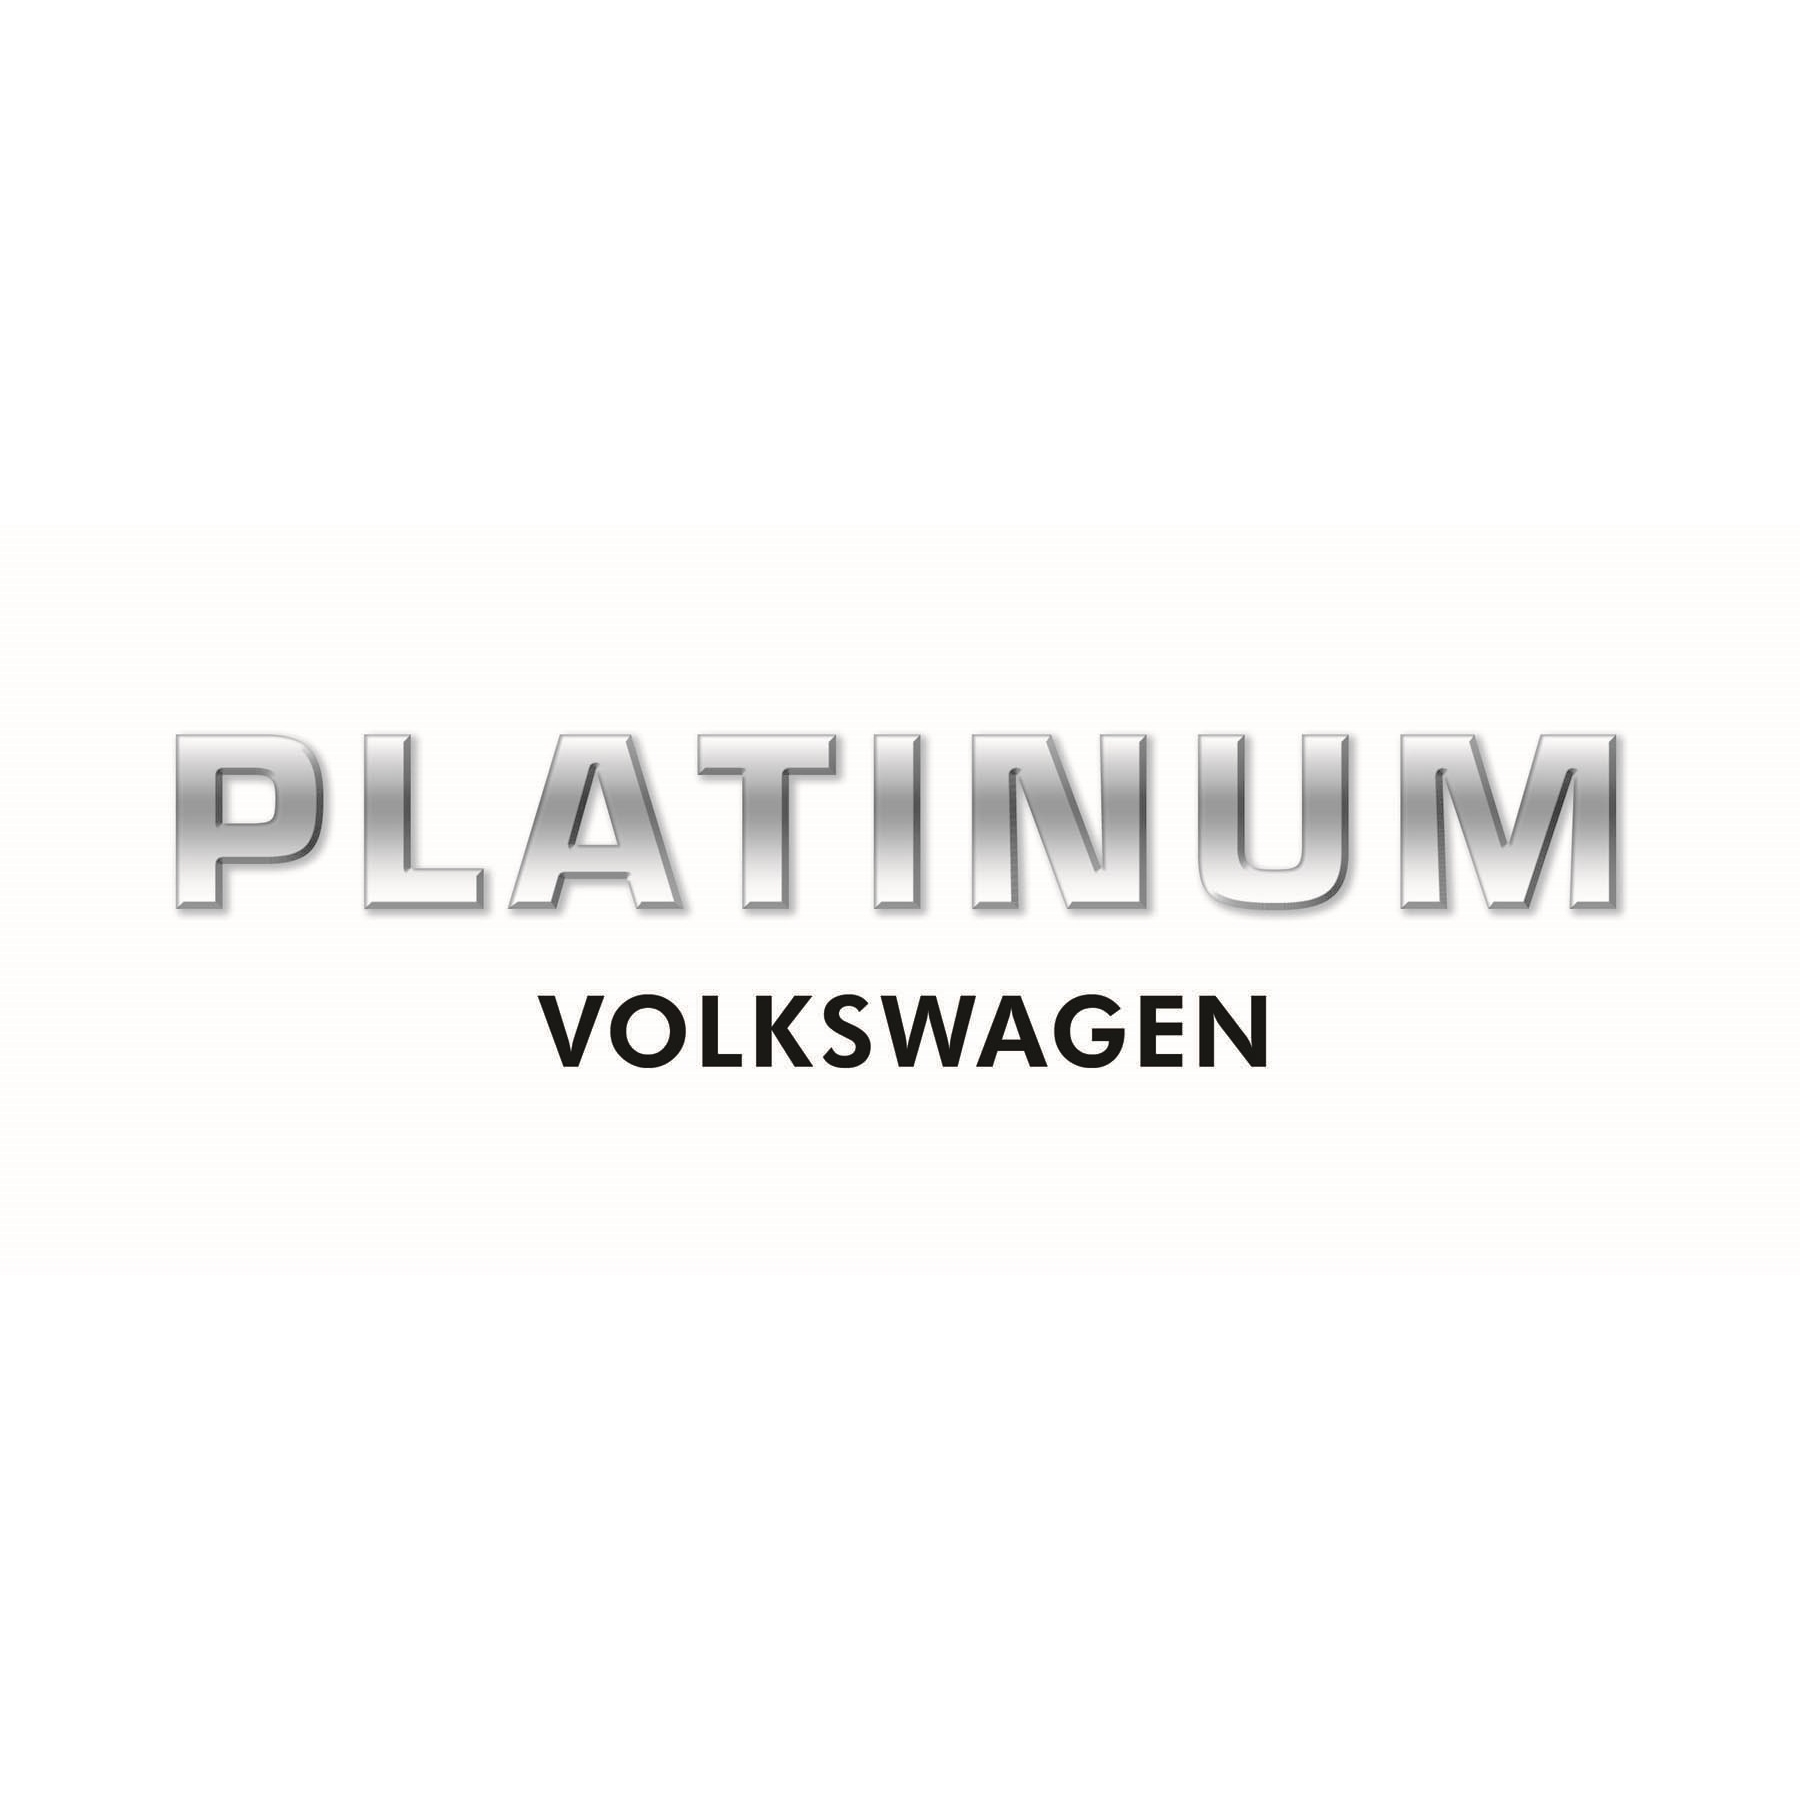 Platinum Volkswagen